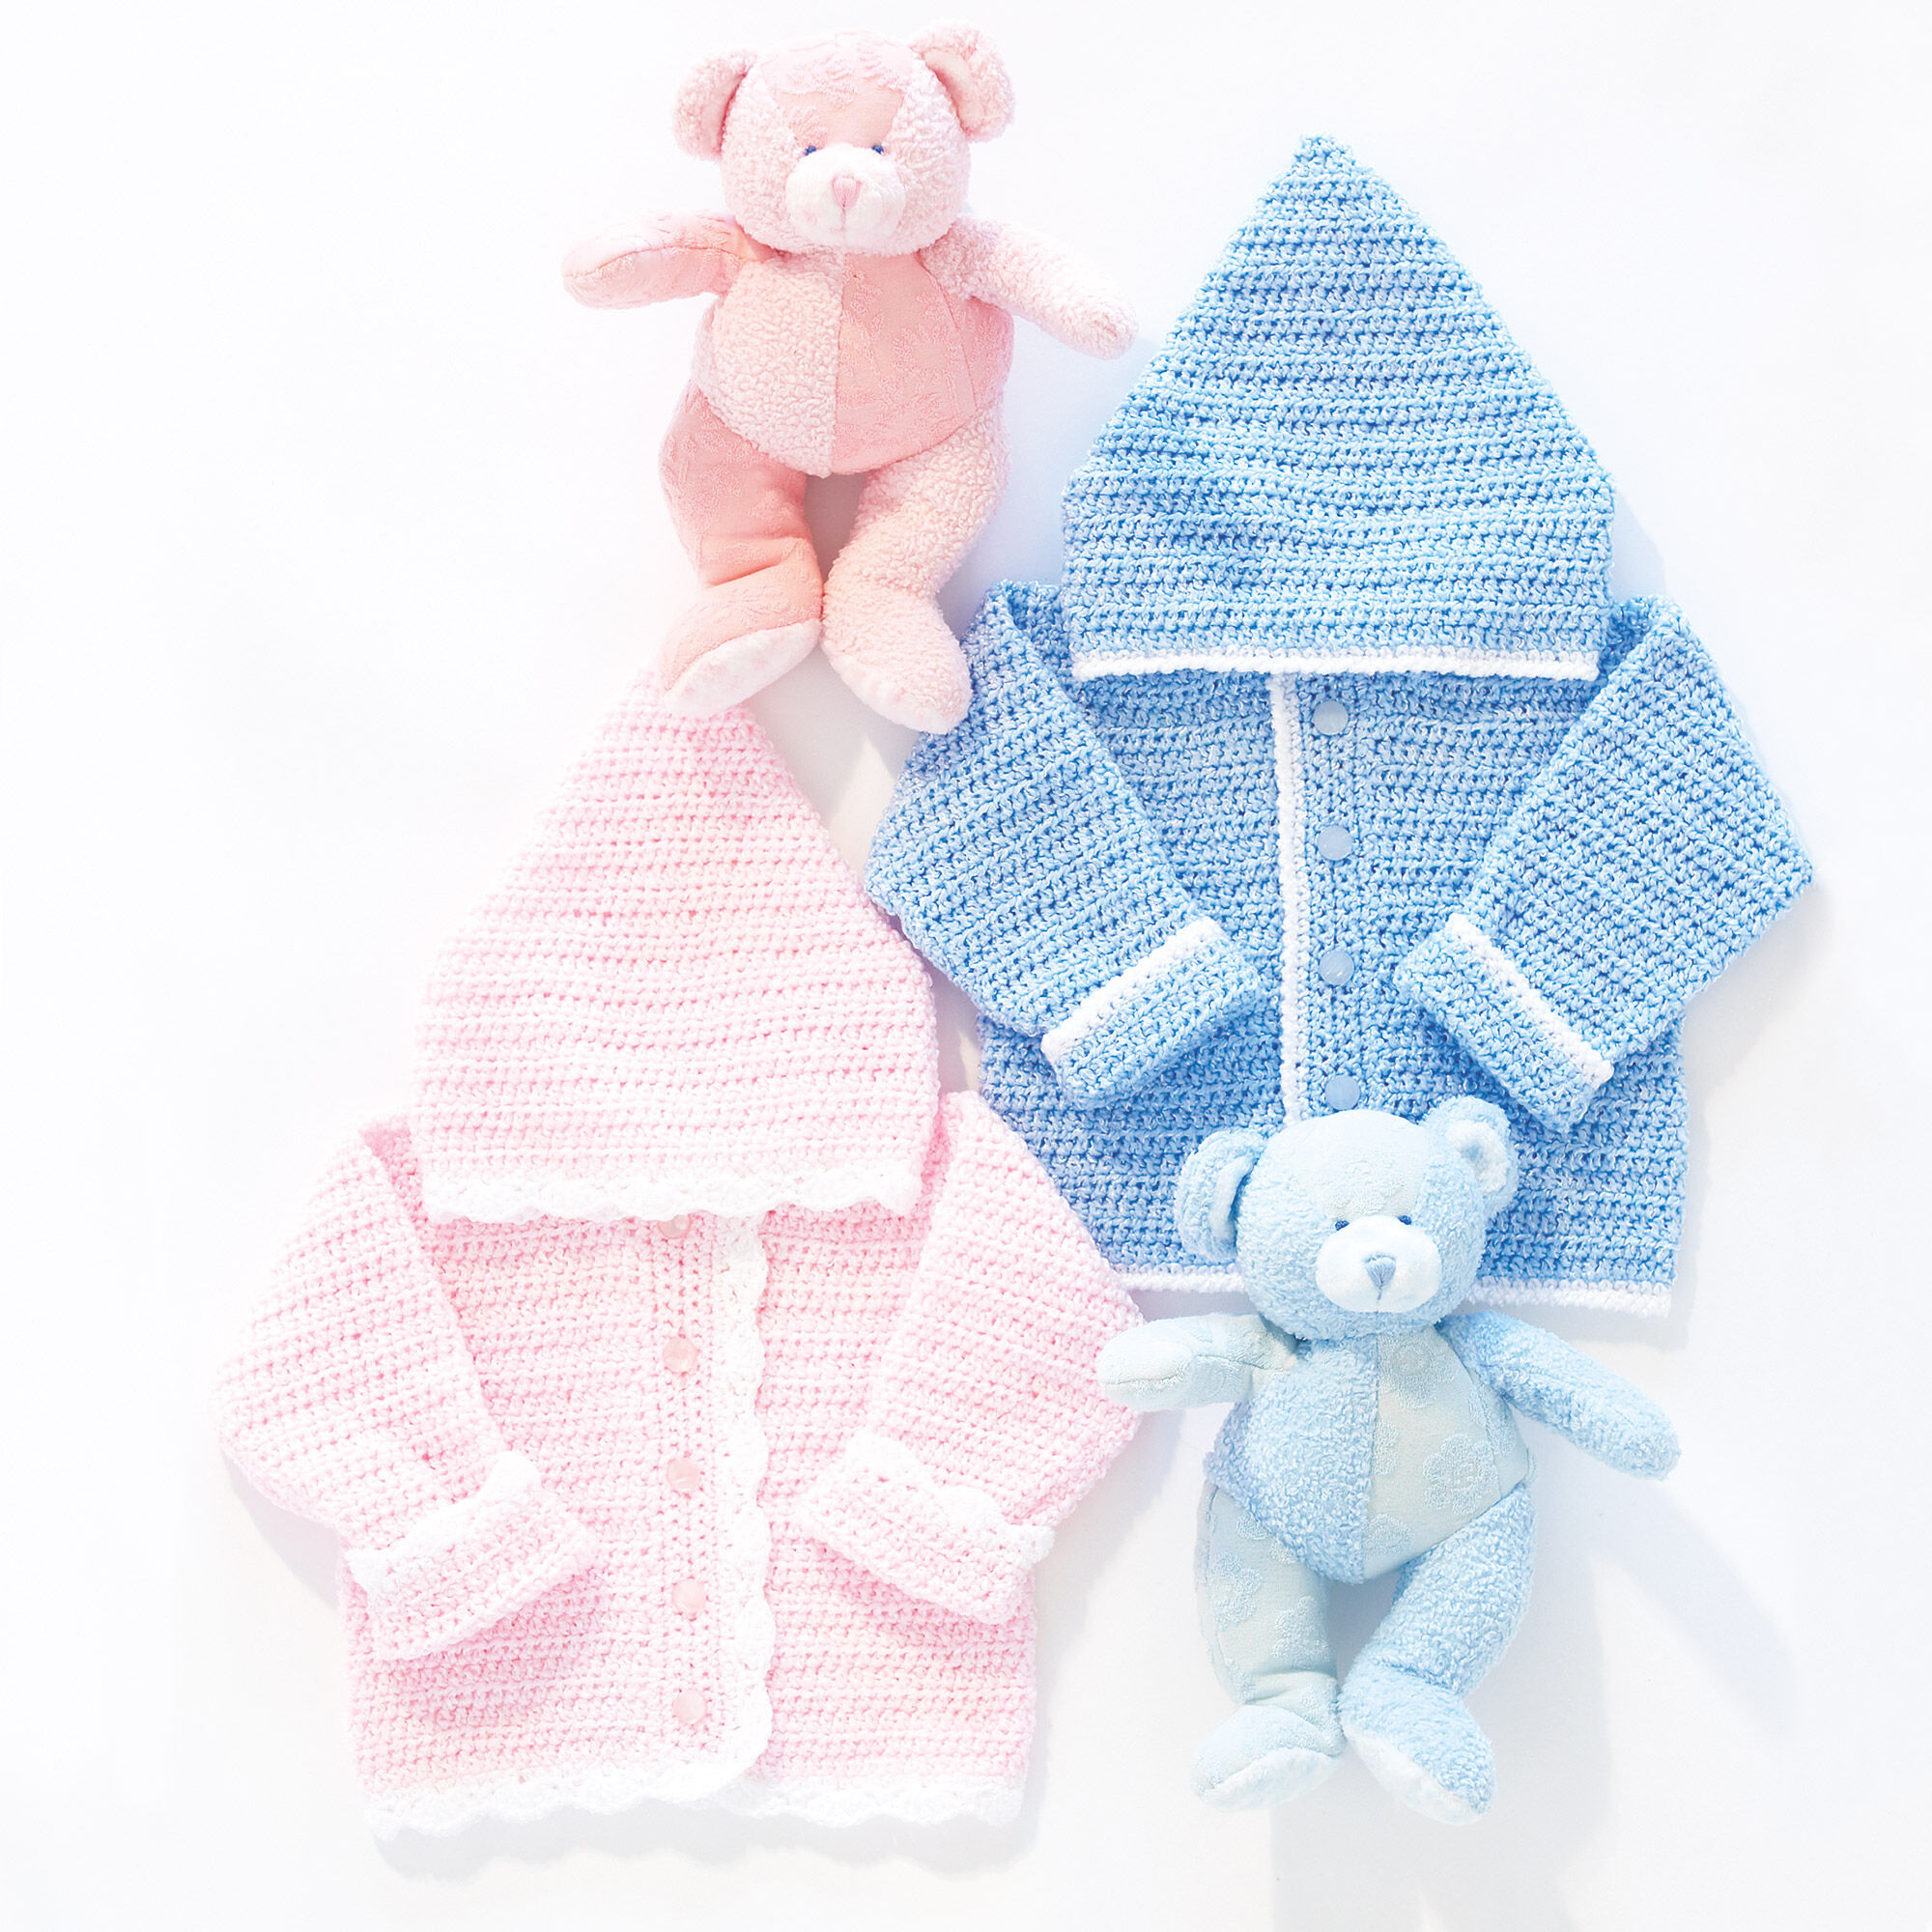 Bernat Sweet Baby Hoodie Crochet Pattern, Boys - 6 mos | Yarnspirations